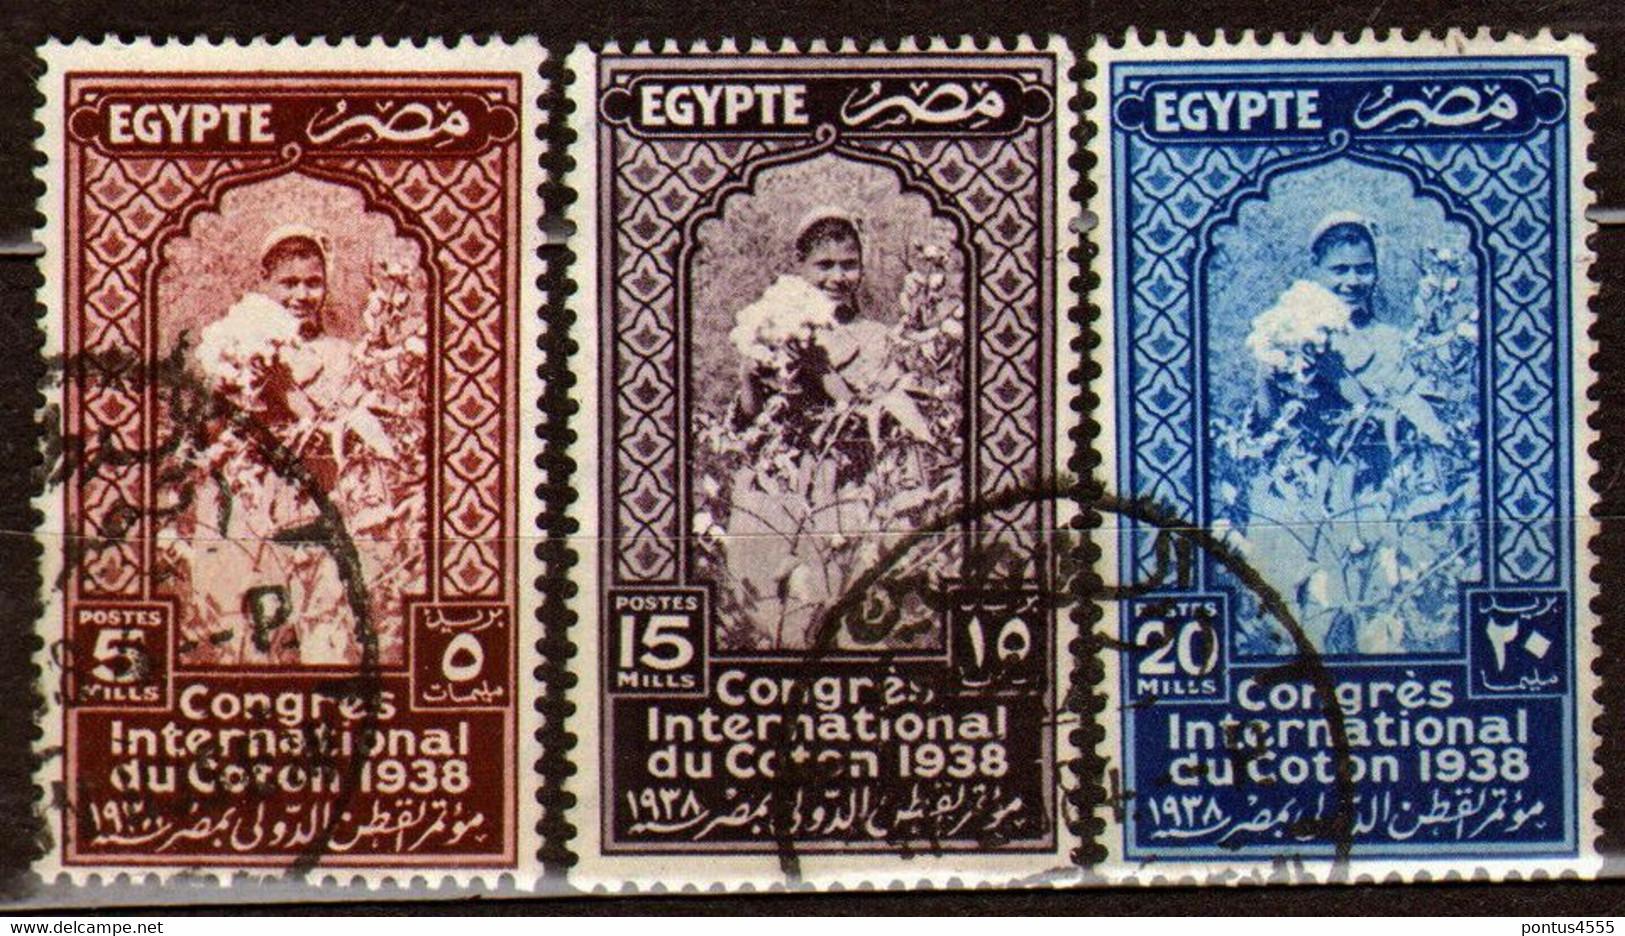 Egypt 1938 Mi 241-243 International Cotton Congress - Cotton Picker - CTO - Used Stamps